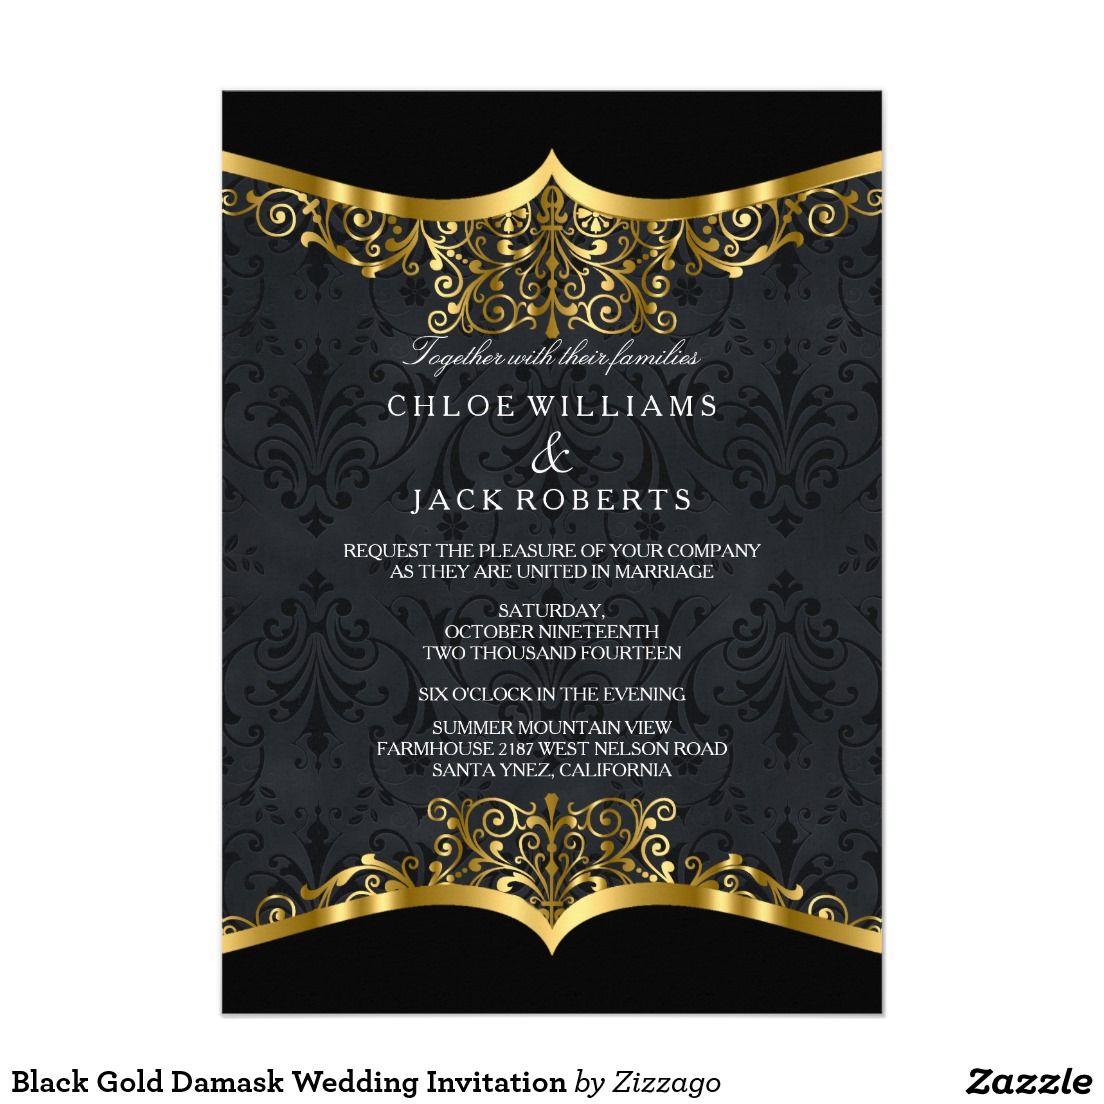 Black Gold Damask Wedding Invitation Zizzago Invitations Pinterest